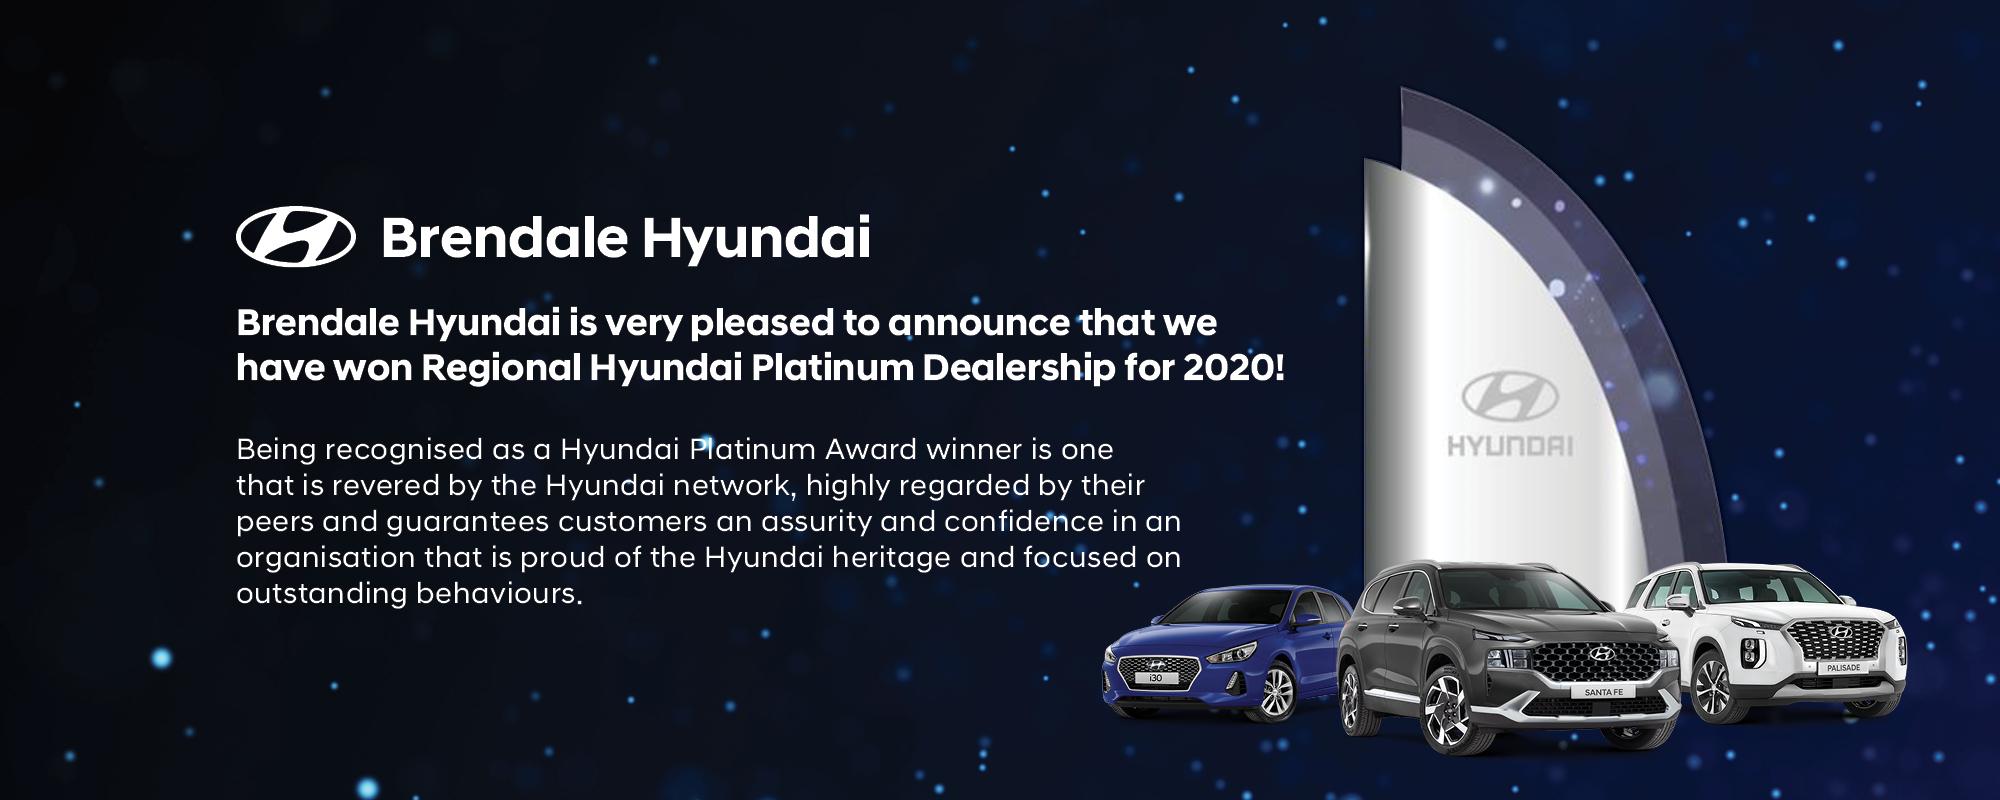 Brendale Hyundai Platinum Award